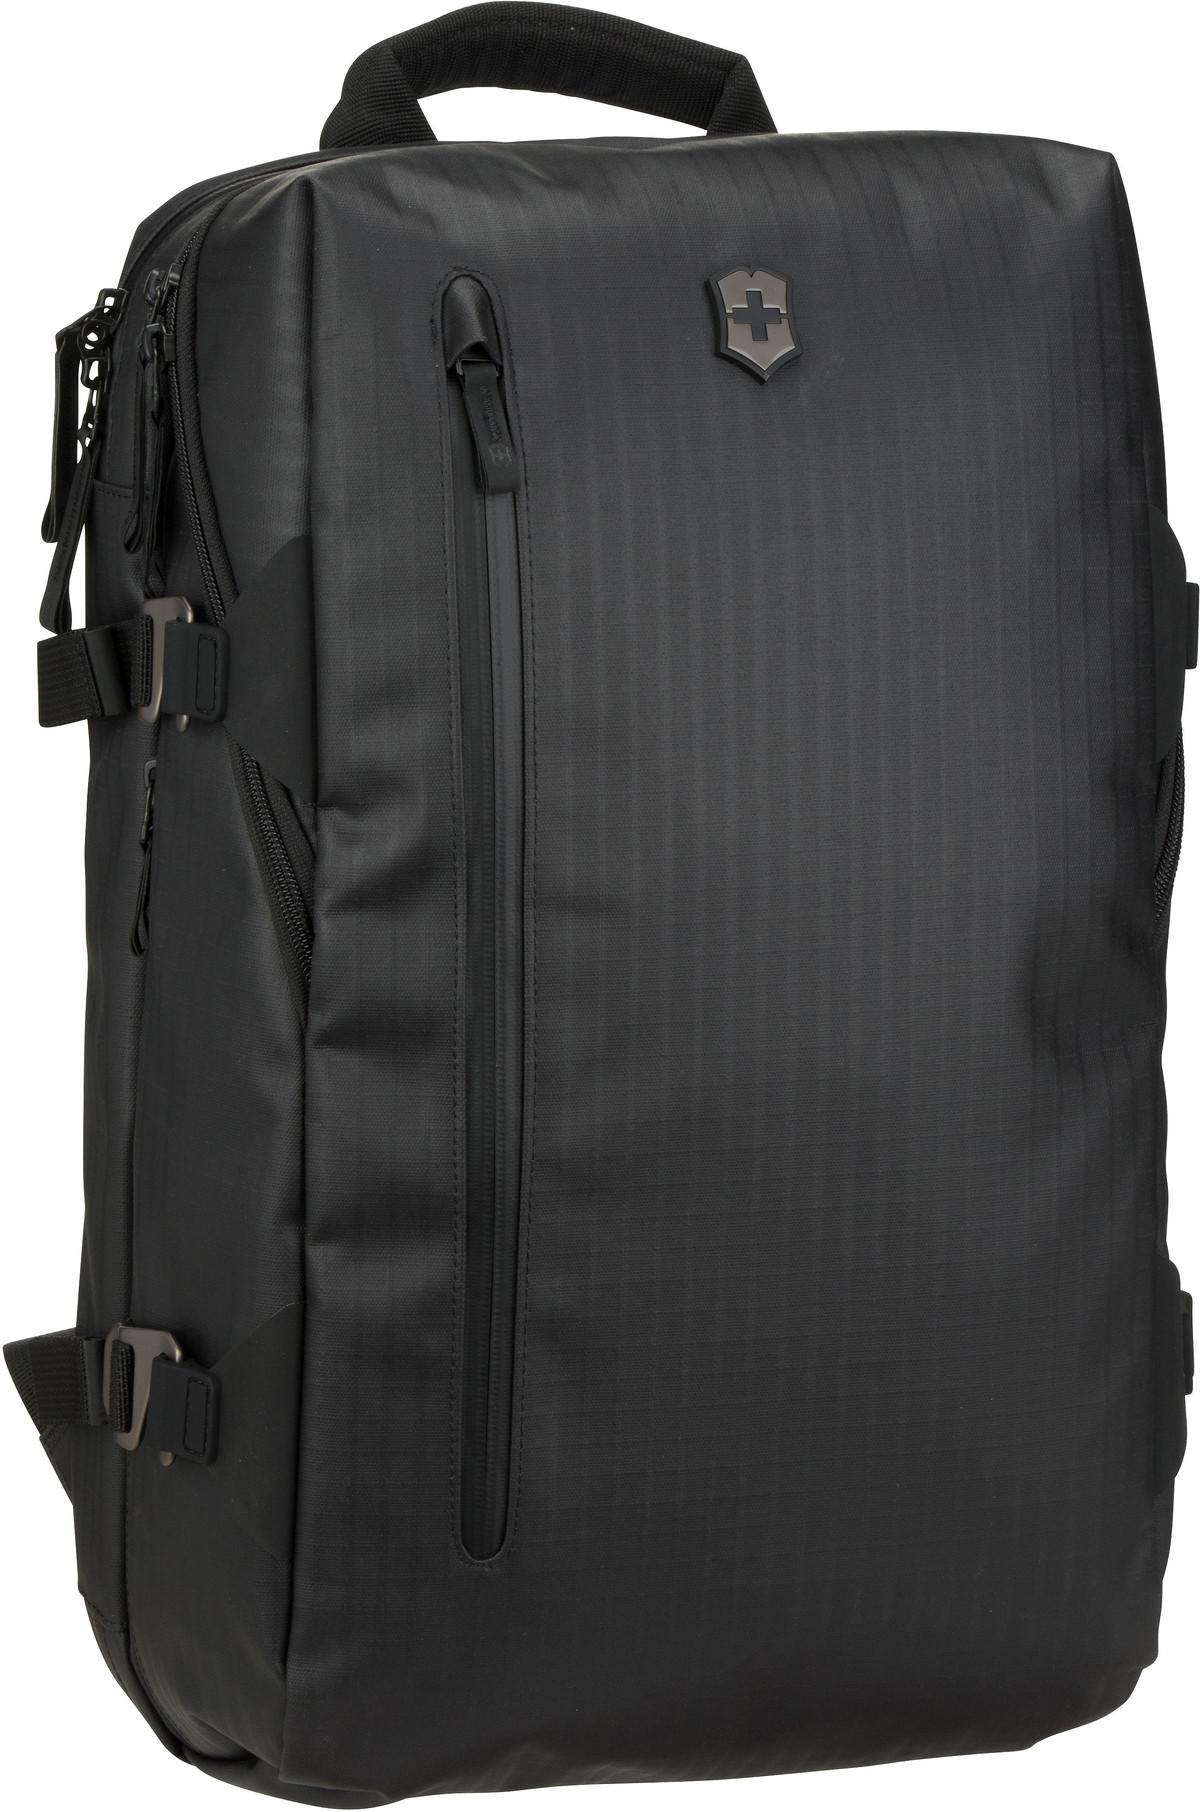 Rucksack / Daypack Vx Touring Laptop Backpack 17'' Black (24 Liter)